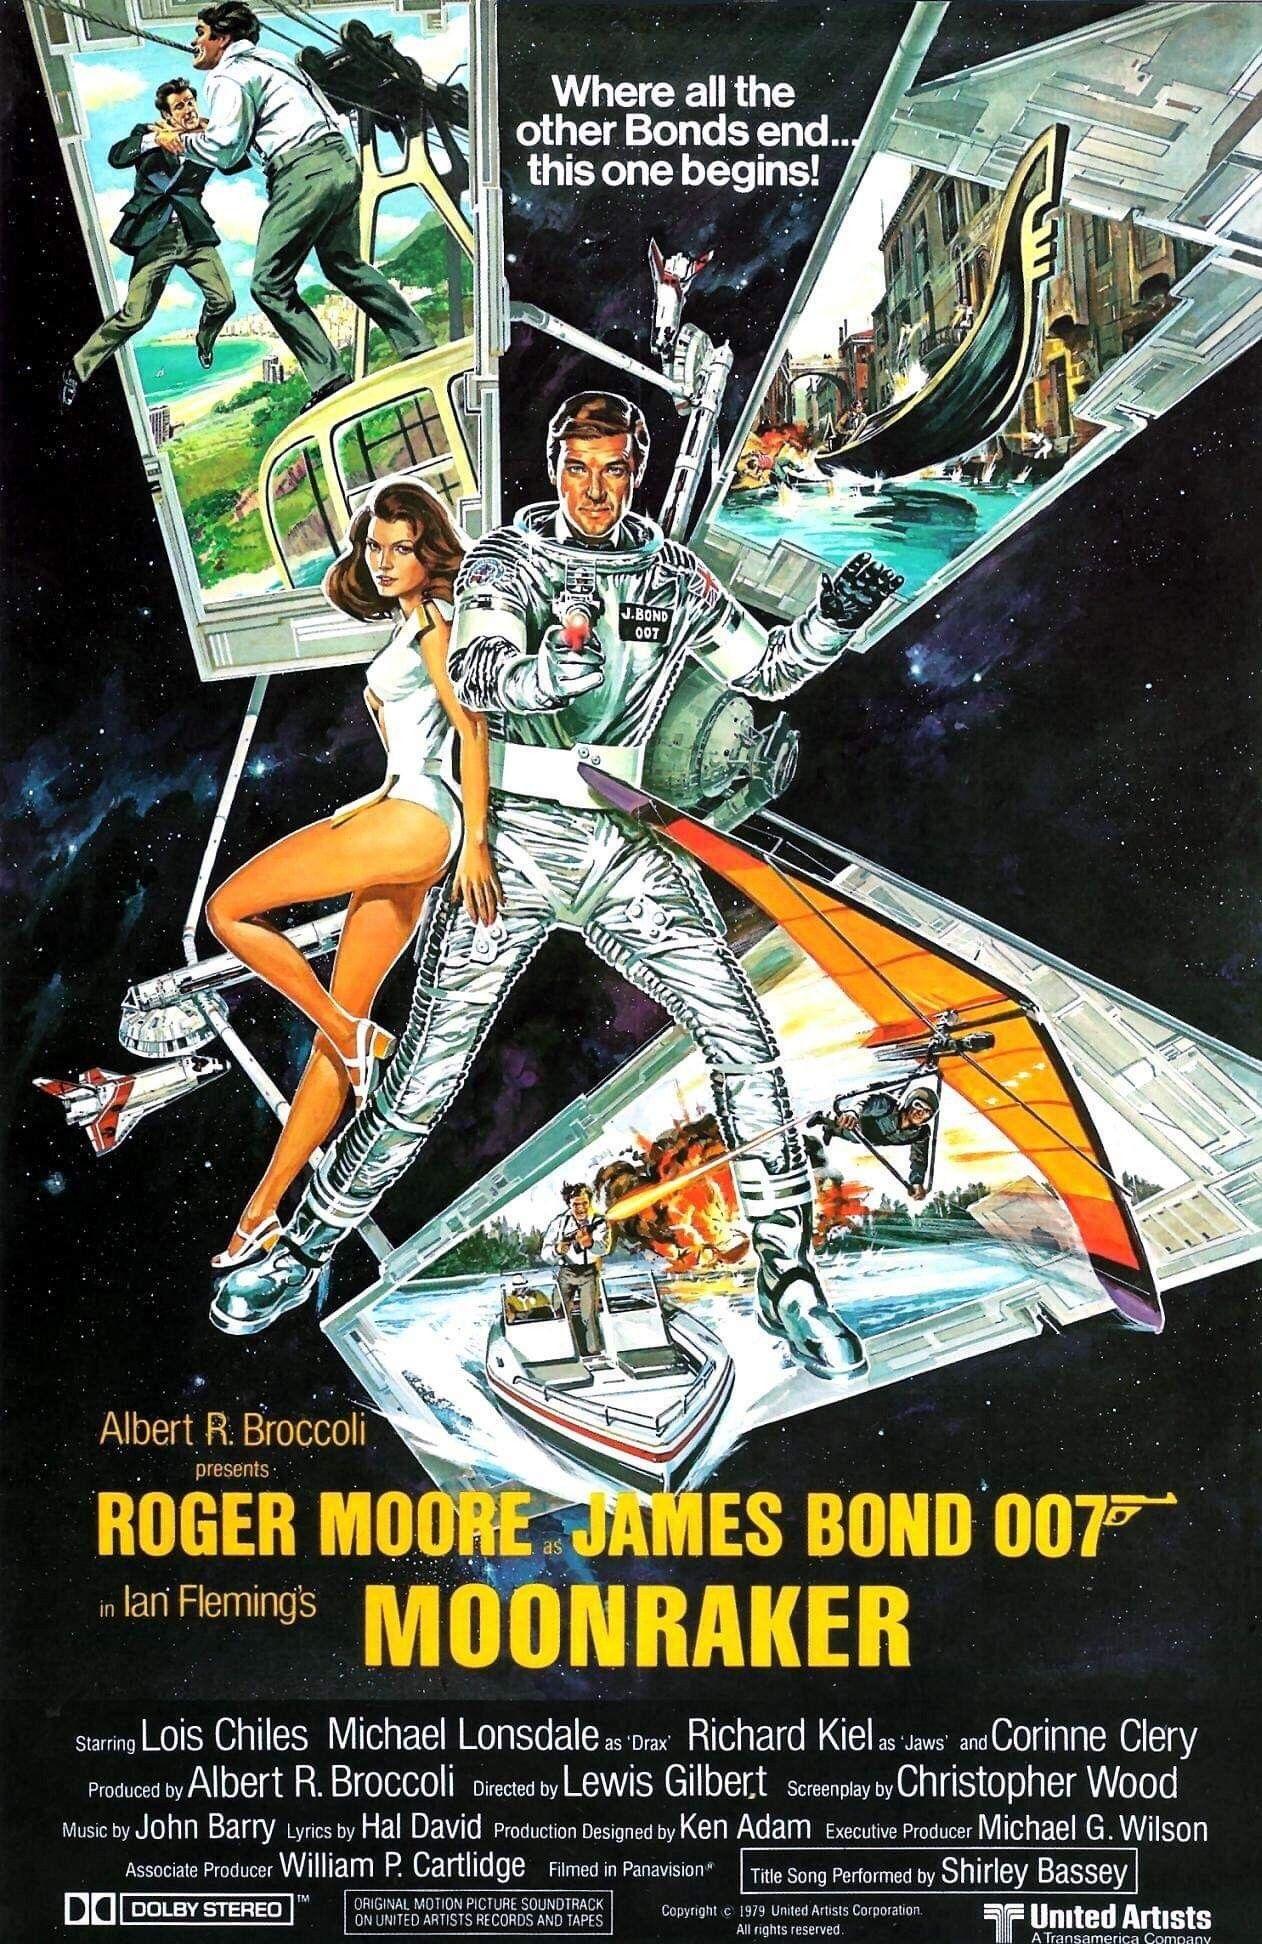 James Bond Movie Posters Image By Alexander Calloway On Retro Pop